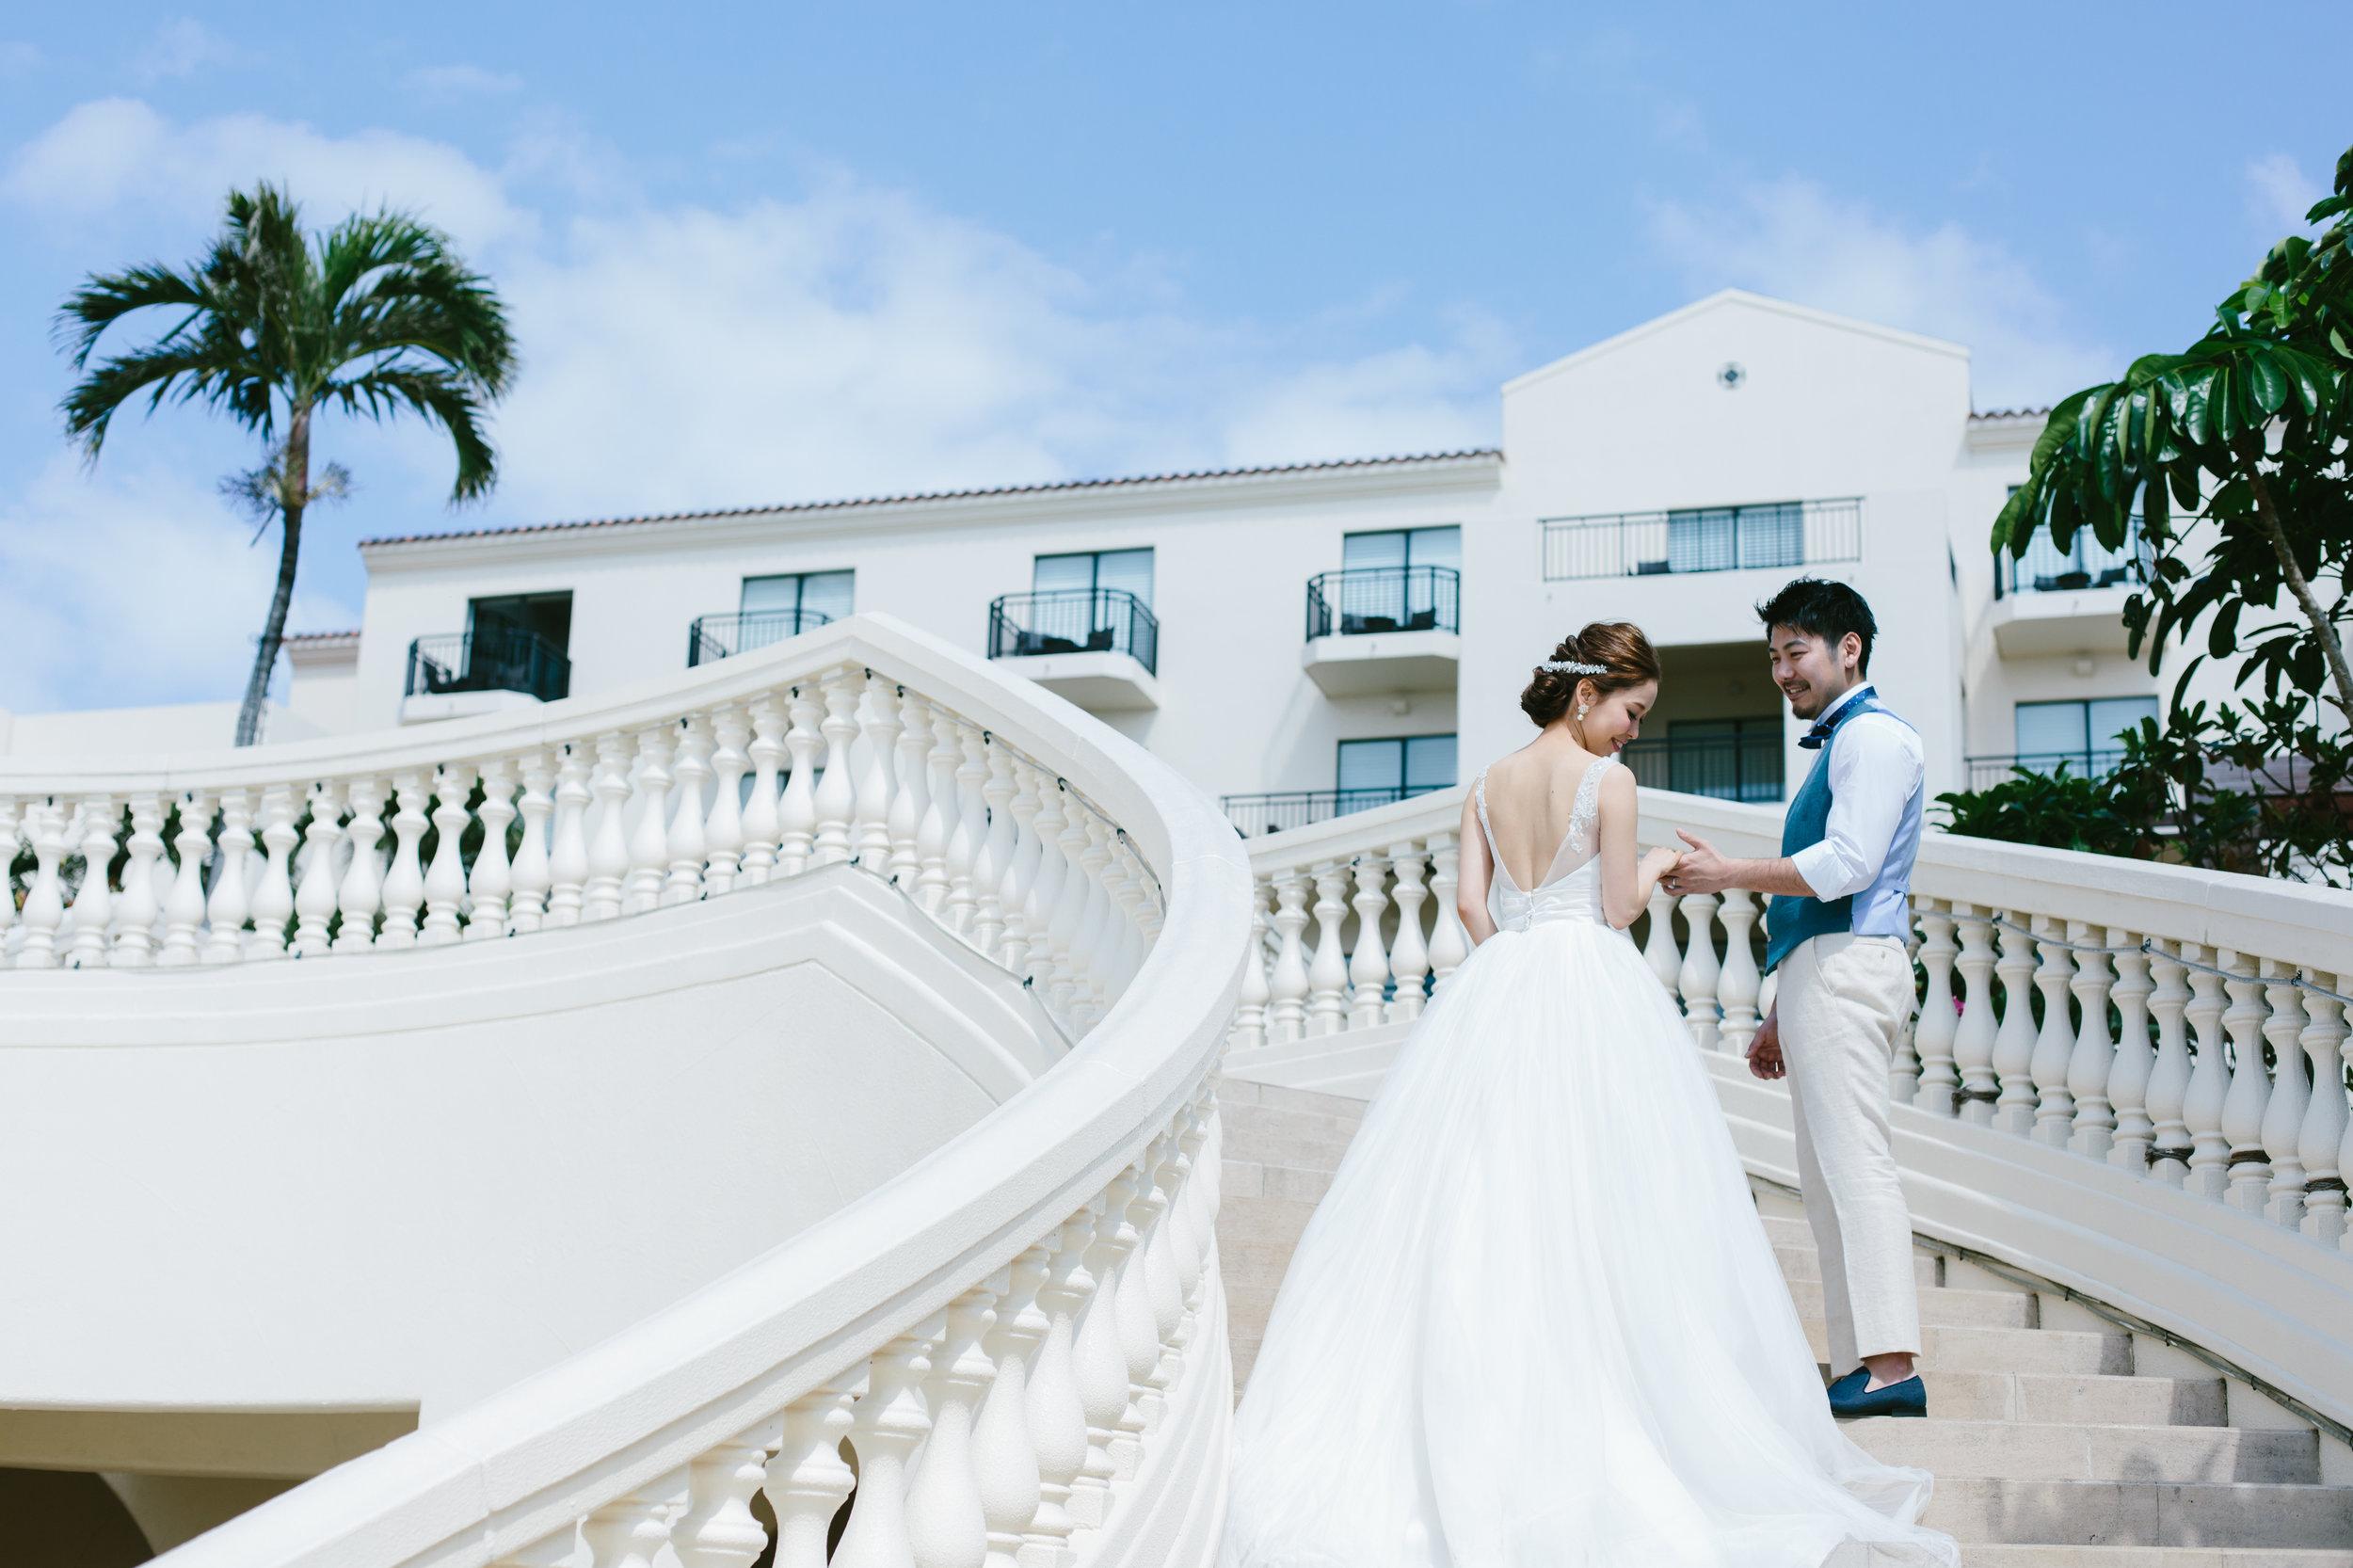 Photo Wedding - 式場によっては 持ち込み撮影自体が不可という事もありますが式後のロケーション撮影のみも可能です。その場合はコチラへ。当日スケジュールに時間の余裕があればホテル施設内やロケーションの撮影も含まれています。